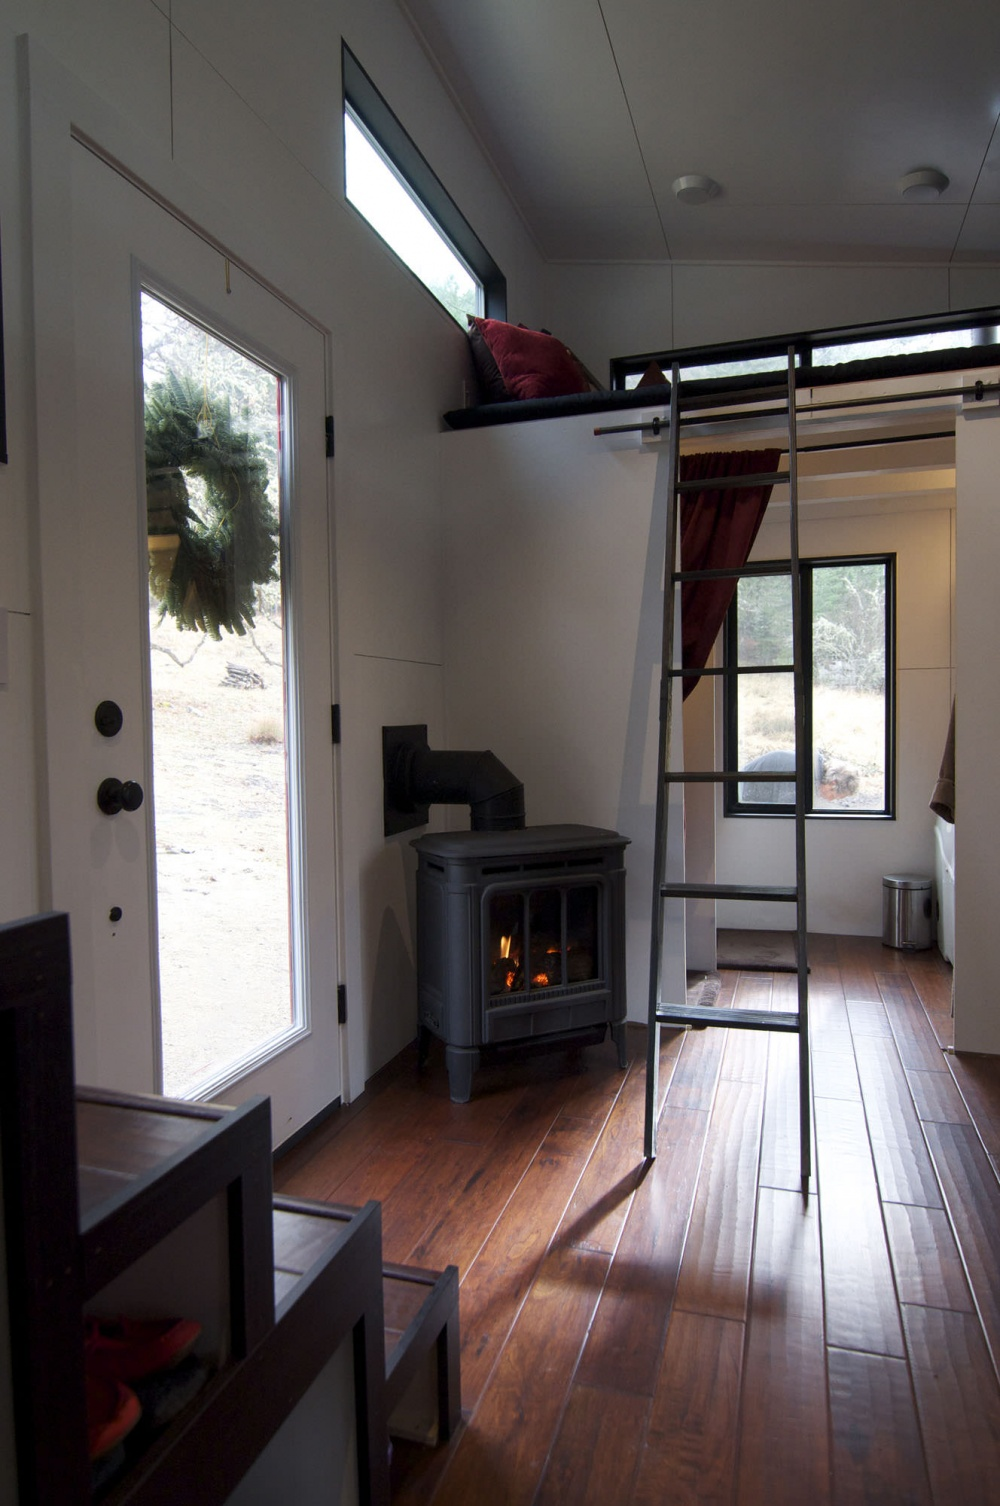 Morrisons Kitchen Appliances Couple Built Their Dream House But What Is Inside Might Surprise